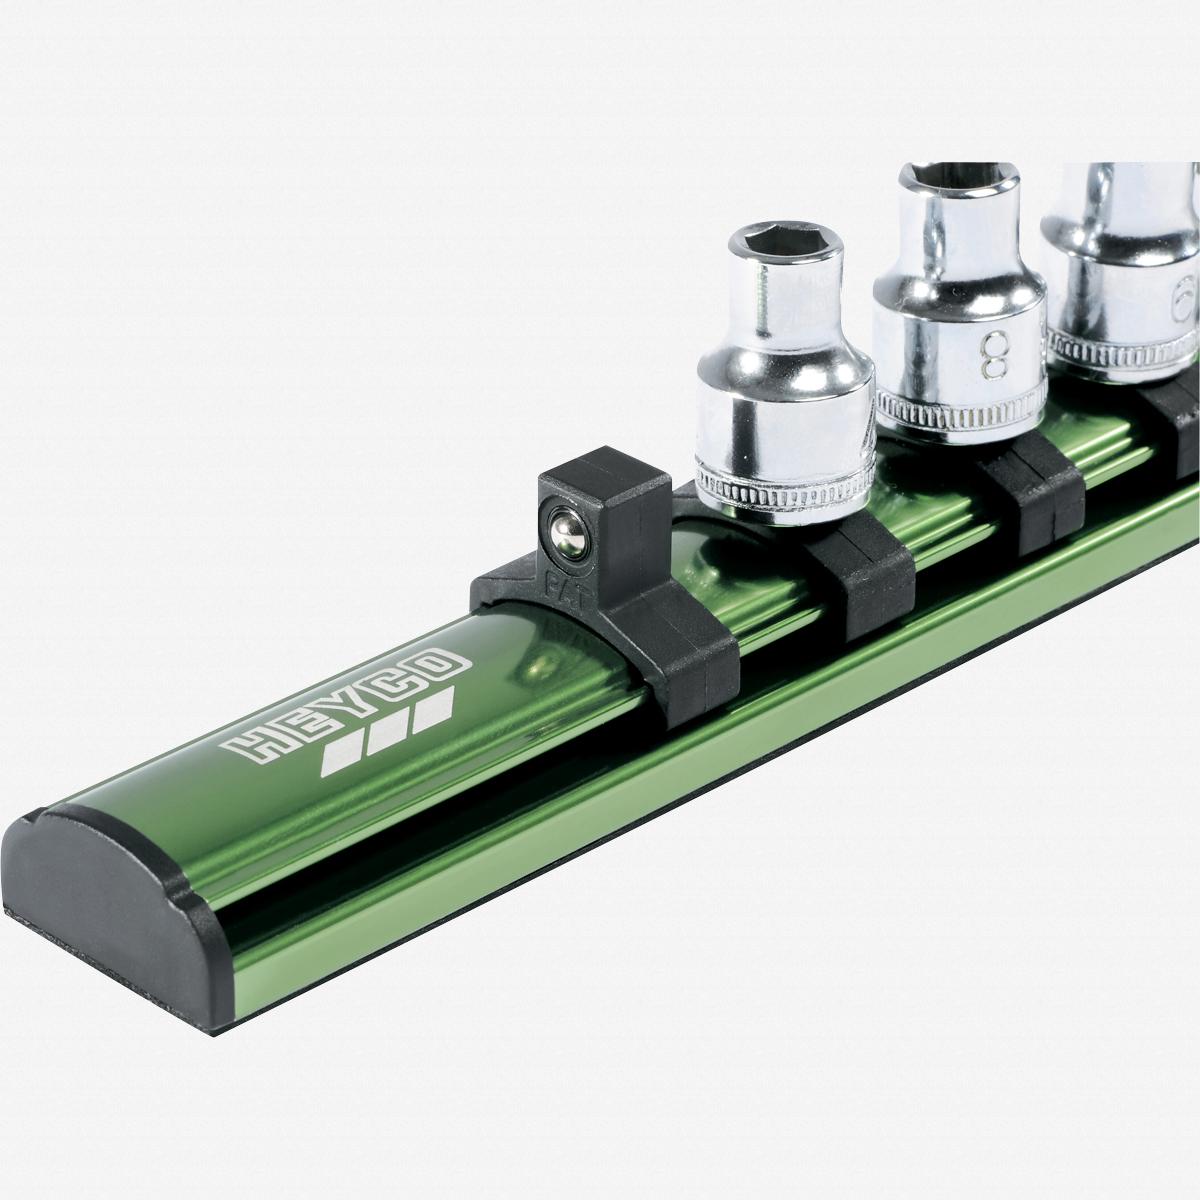 "Heyco 7104016 Magnetic Aluminum Socket Rail - Empty, 3/8"" Drive - KC Tool"